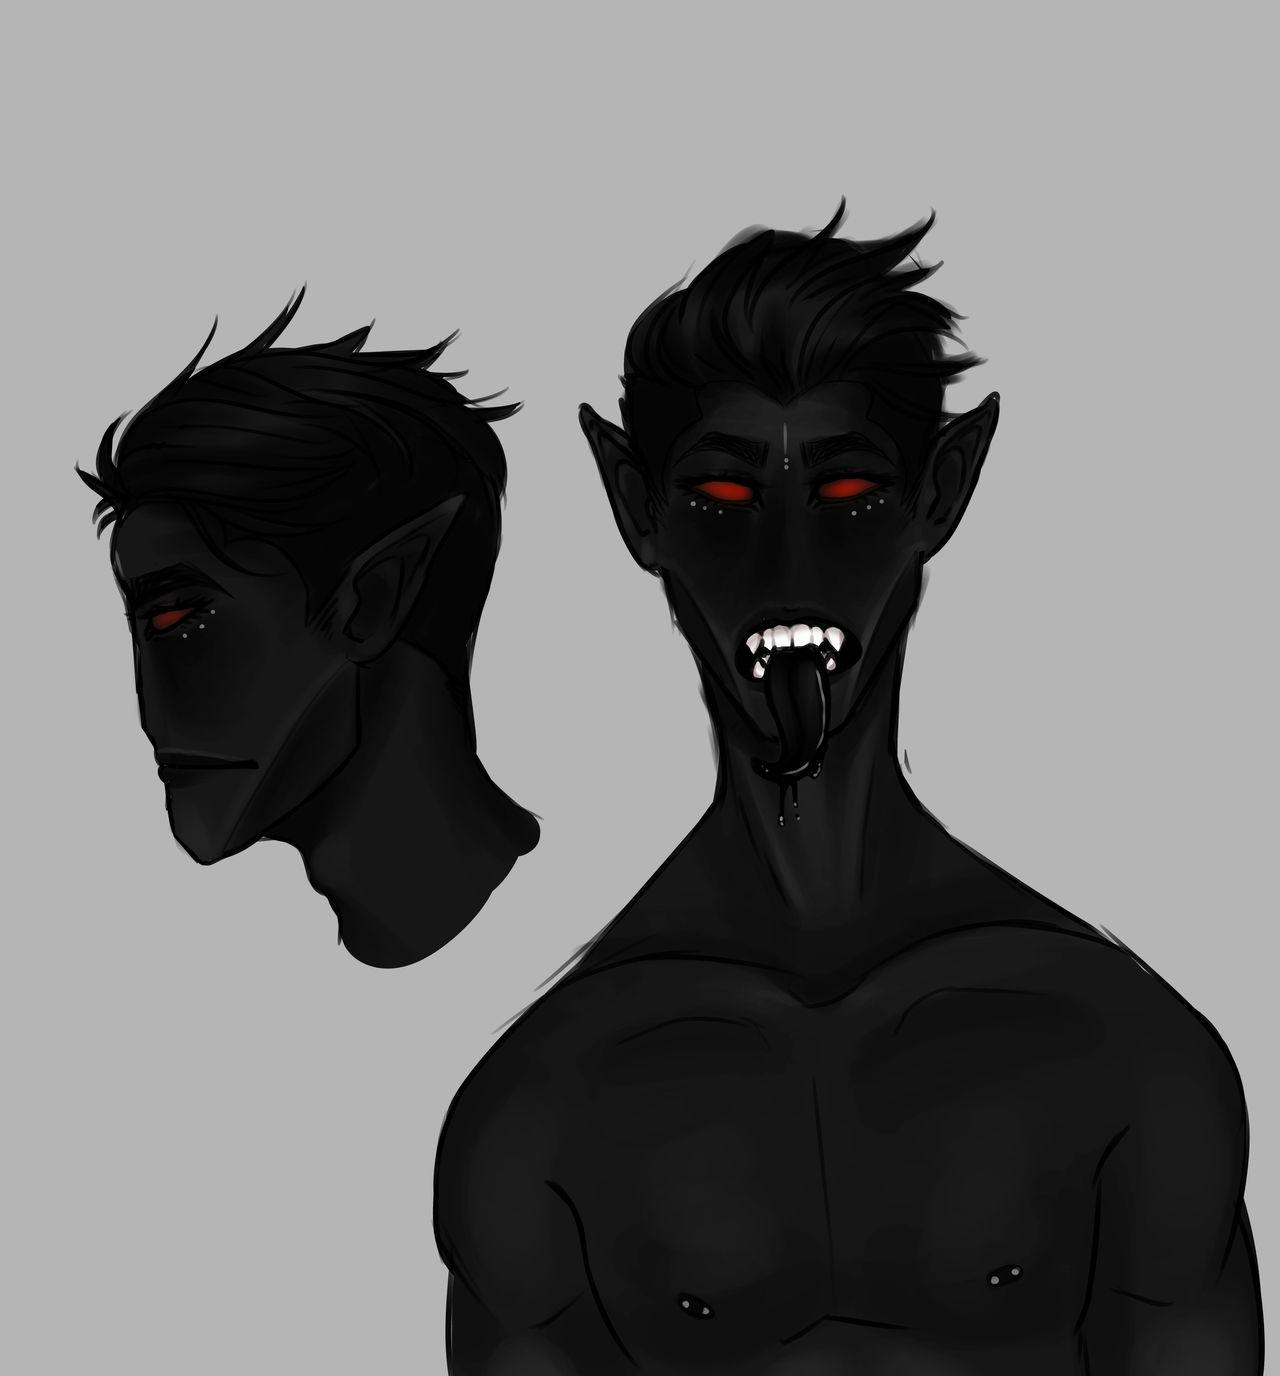 sleep paralysis demon by deerdust on DeviantArt